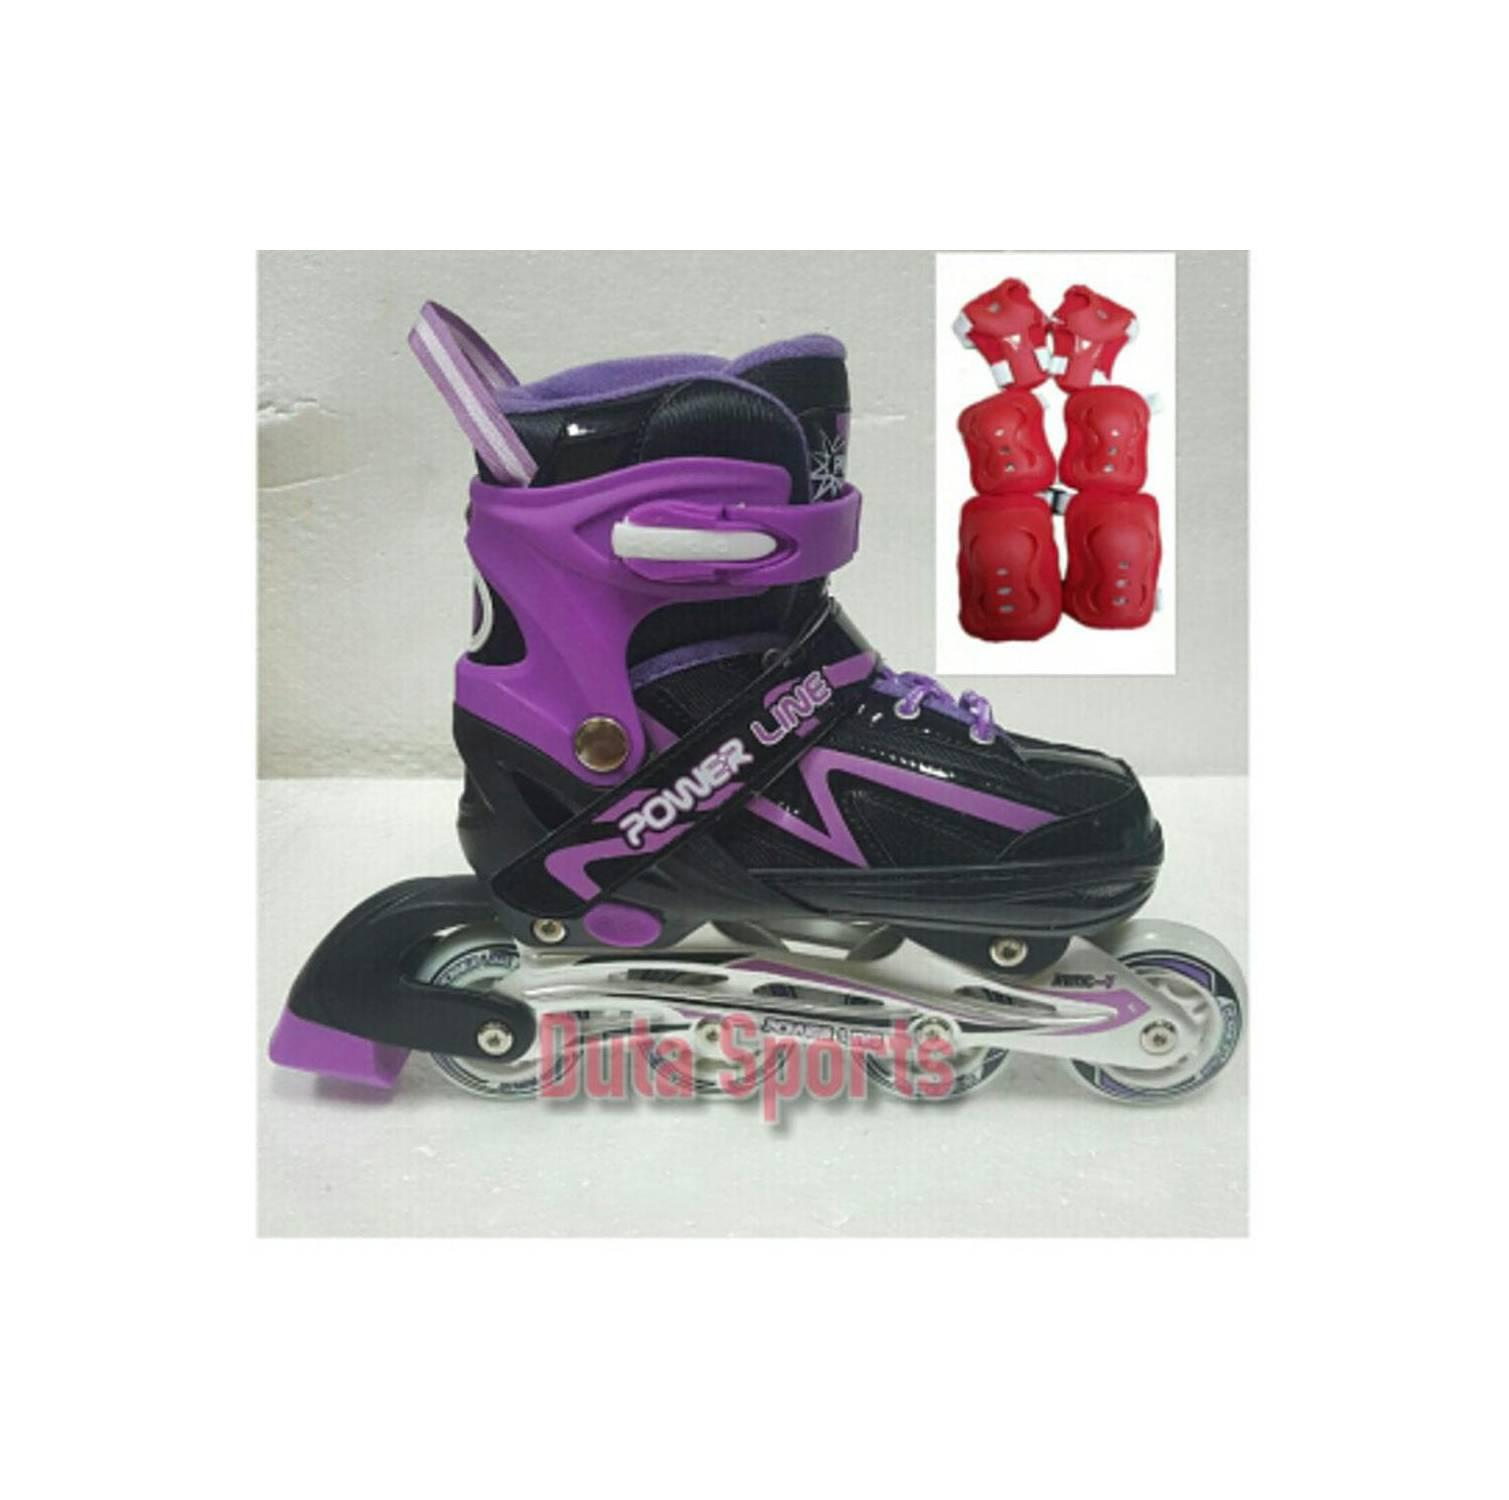 Sport Power Line Sepatu Roda Anak Biru - Daftar Harga Terbaru dan ... 1769a038fa